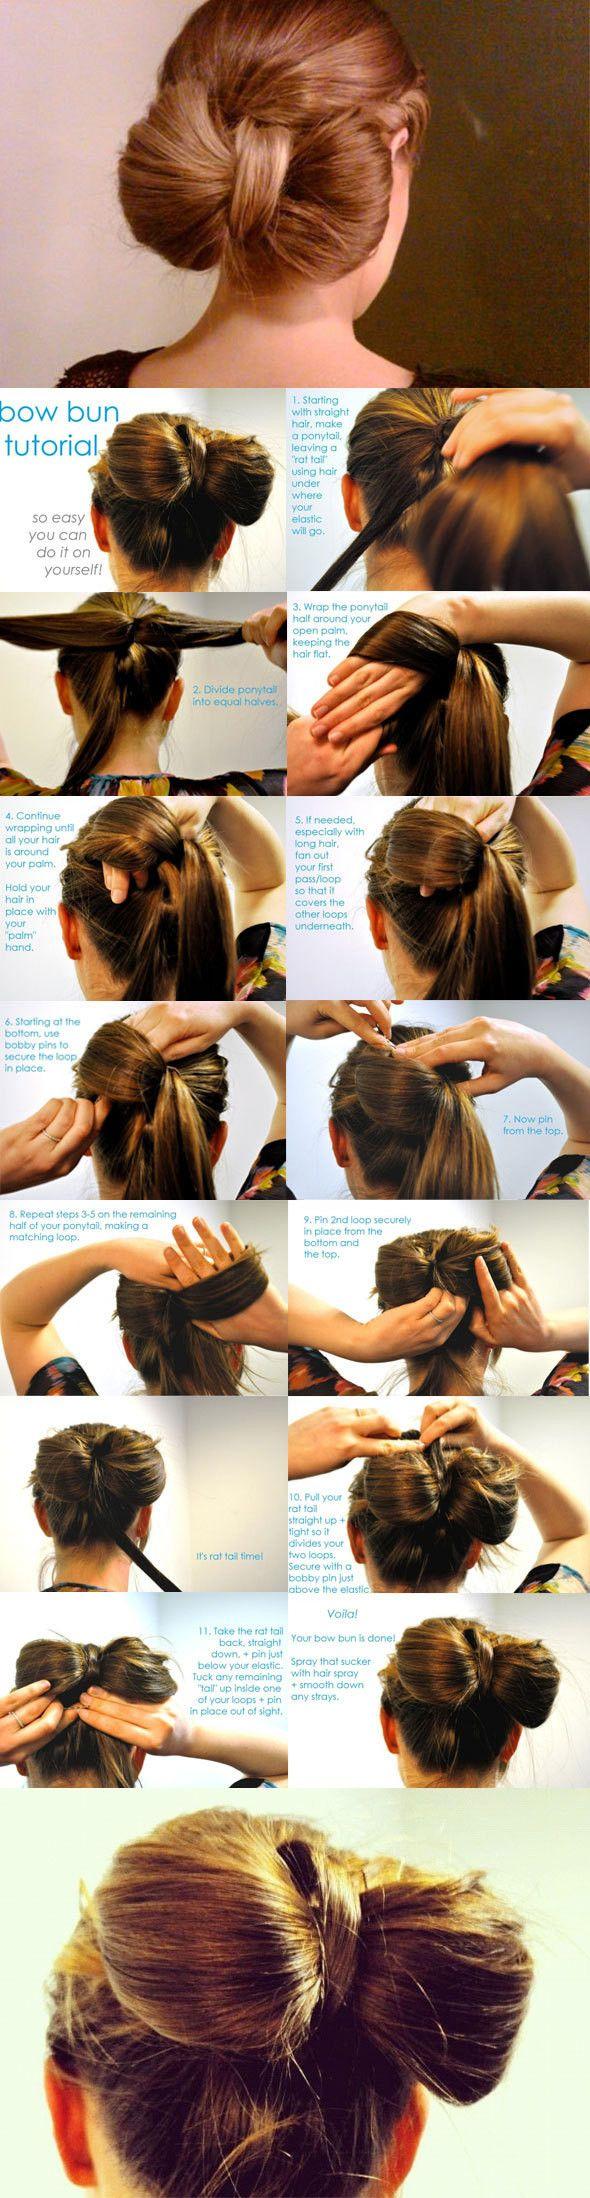 bow hairHairbows, Hair Tutorials, Hairstyles, Bows Buns, Bow Buns, Beautiful, Buns Tutorials, Hair Bows, Hair Style